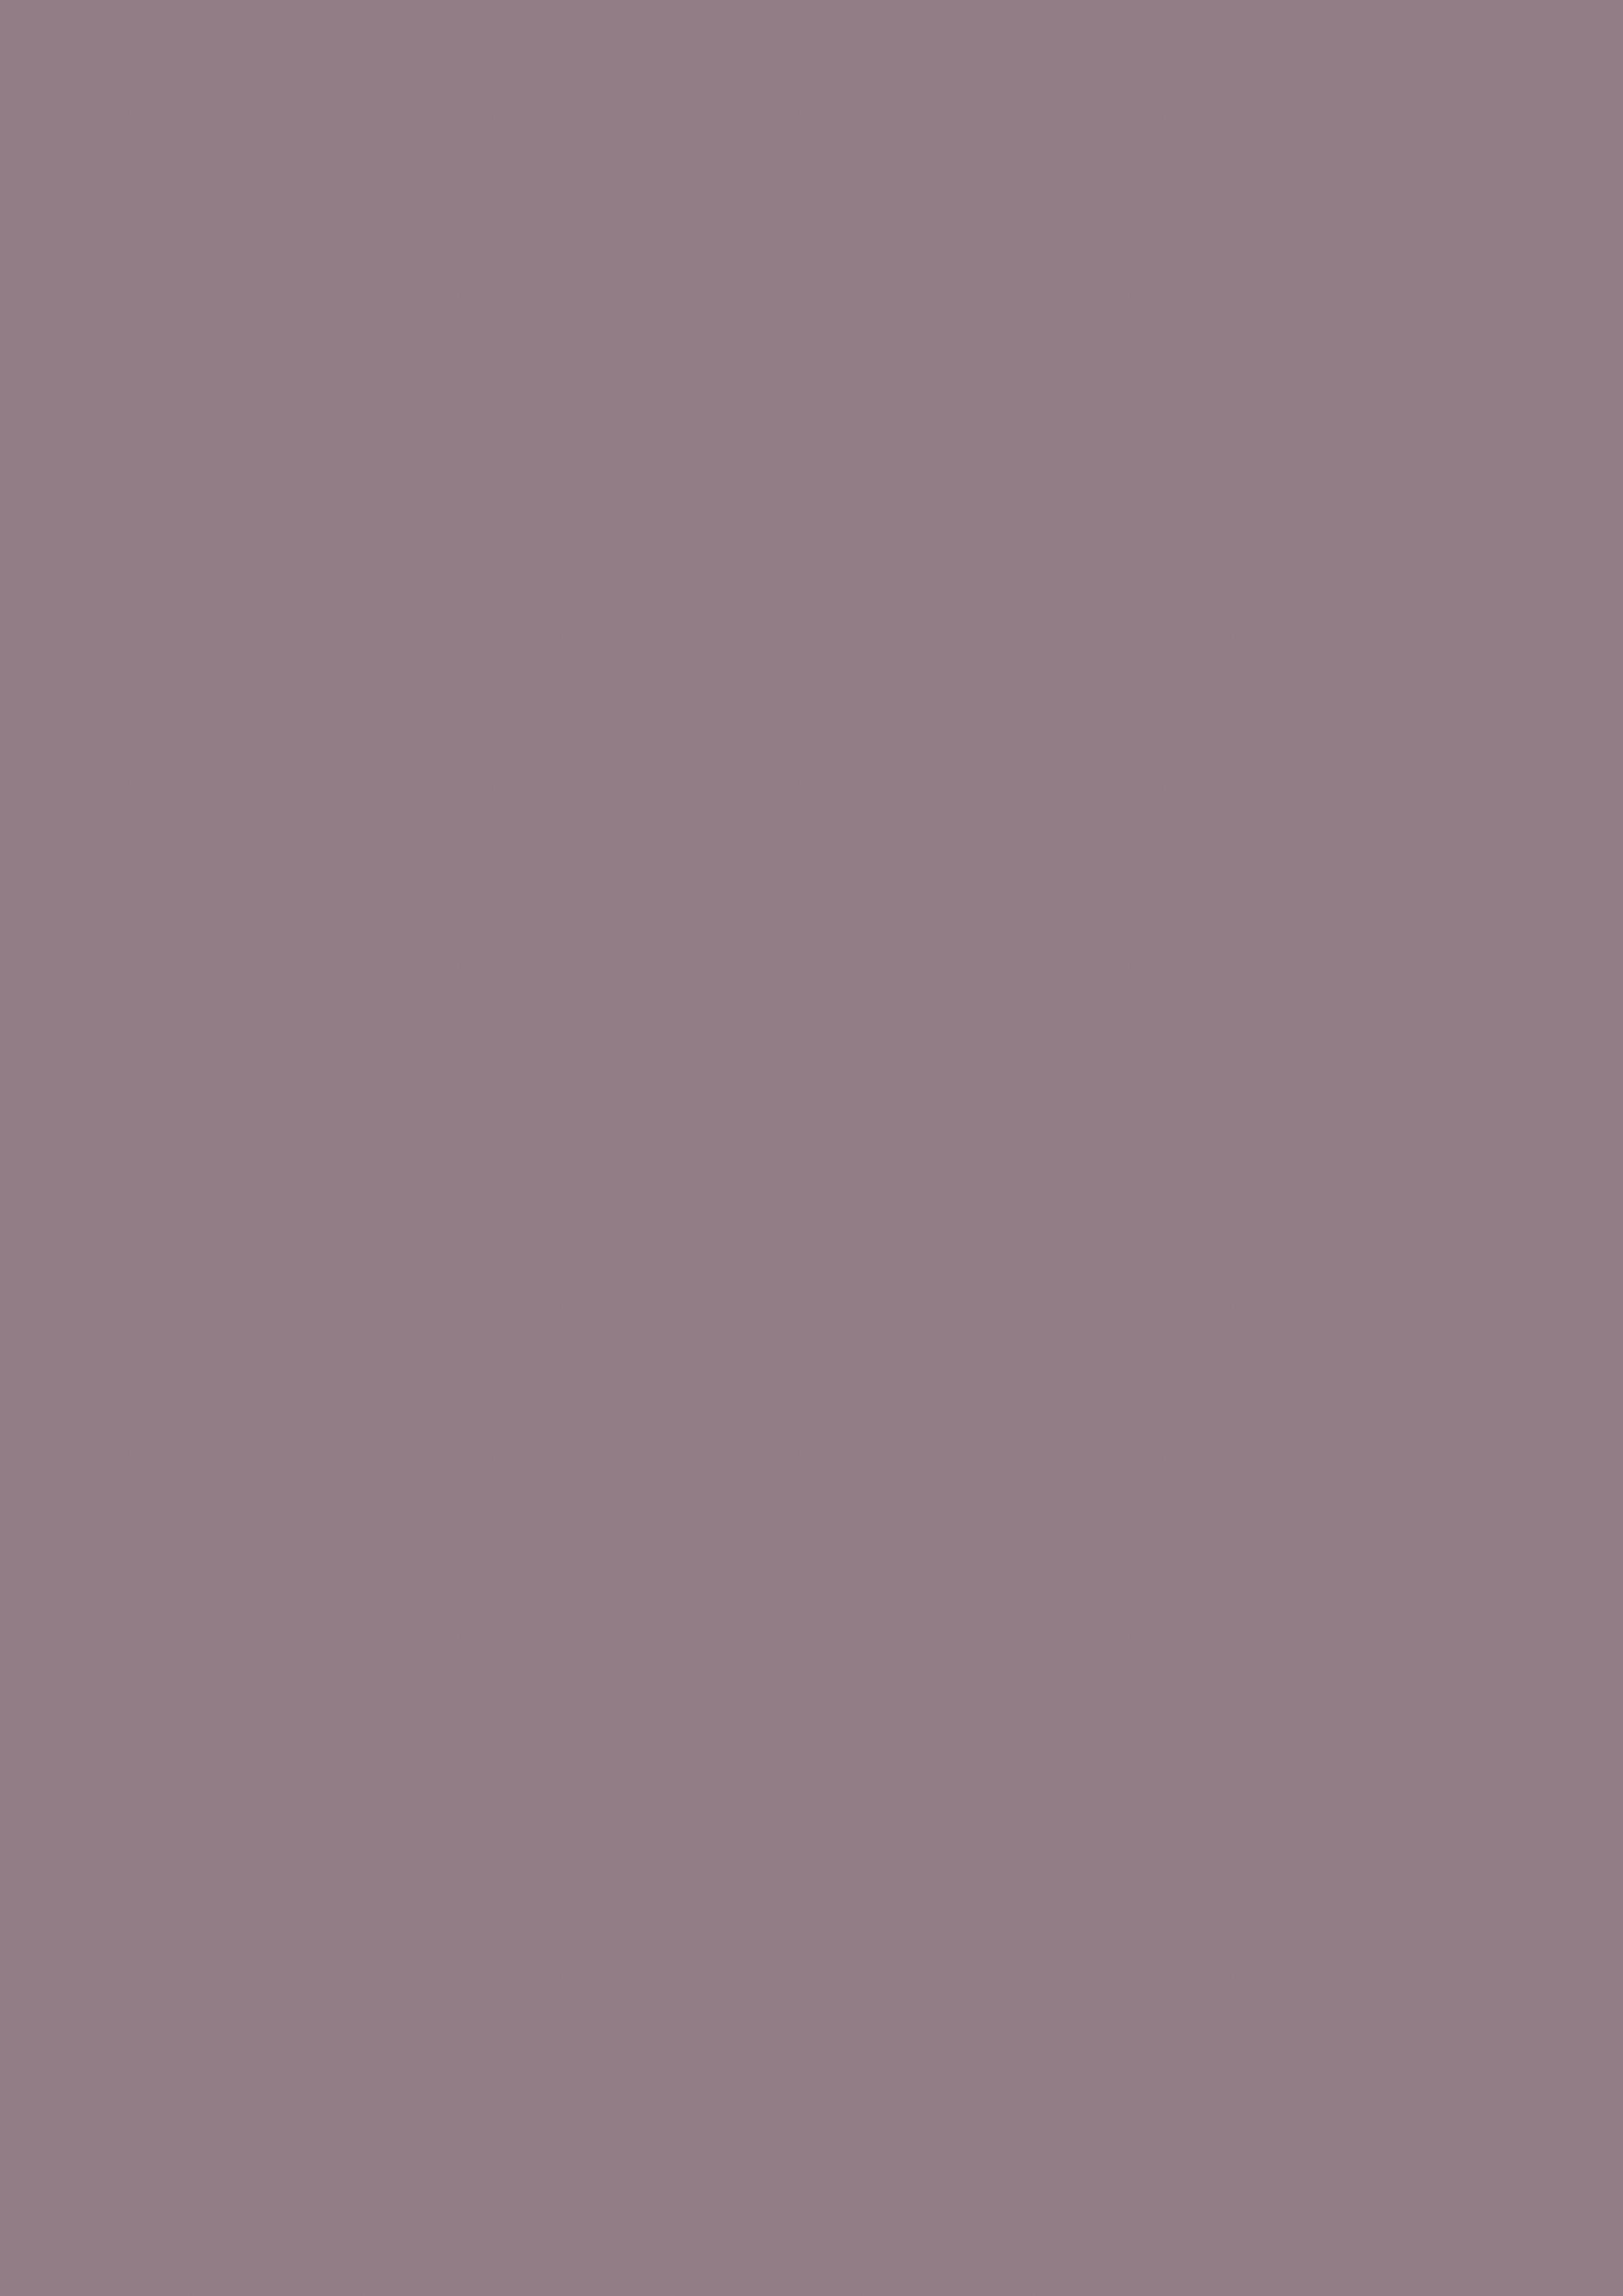 Plum (U1795FG)